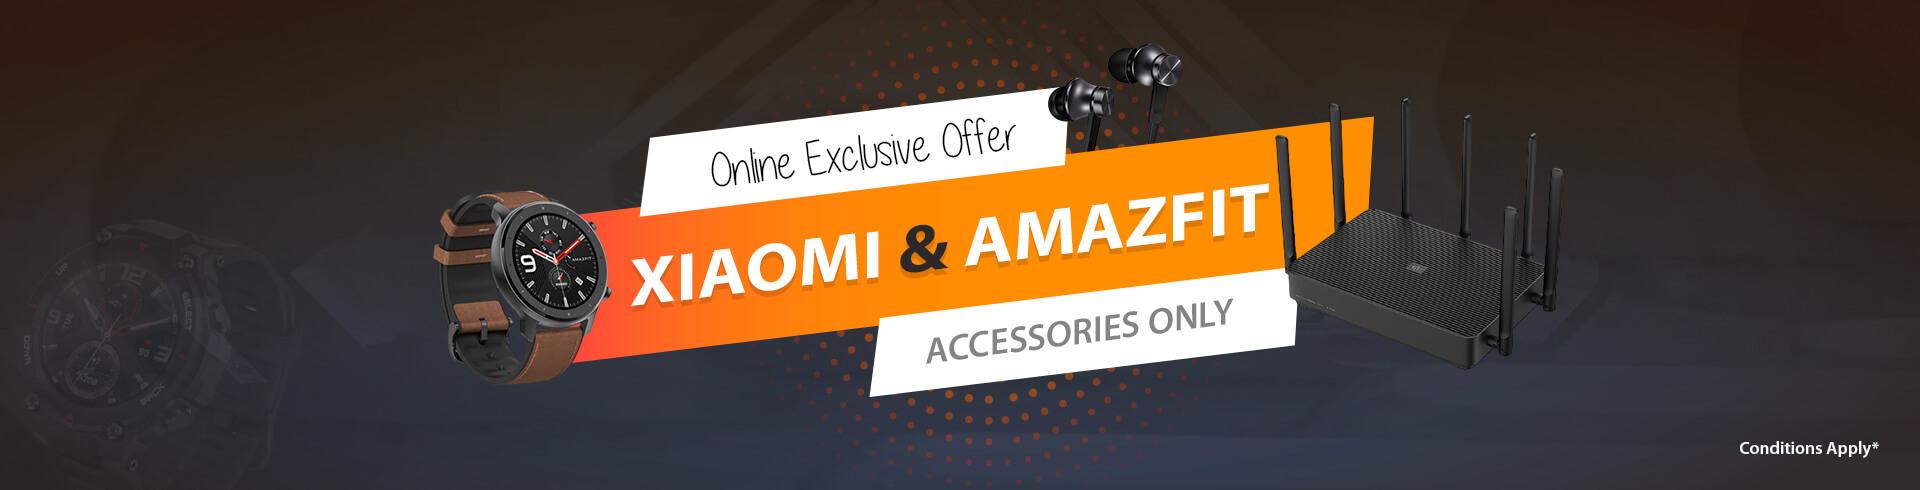 Xiaomi & Amazfit Offer